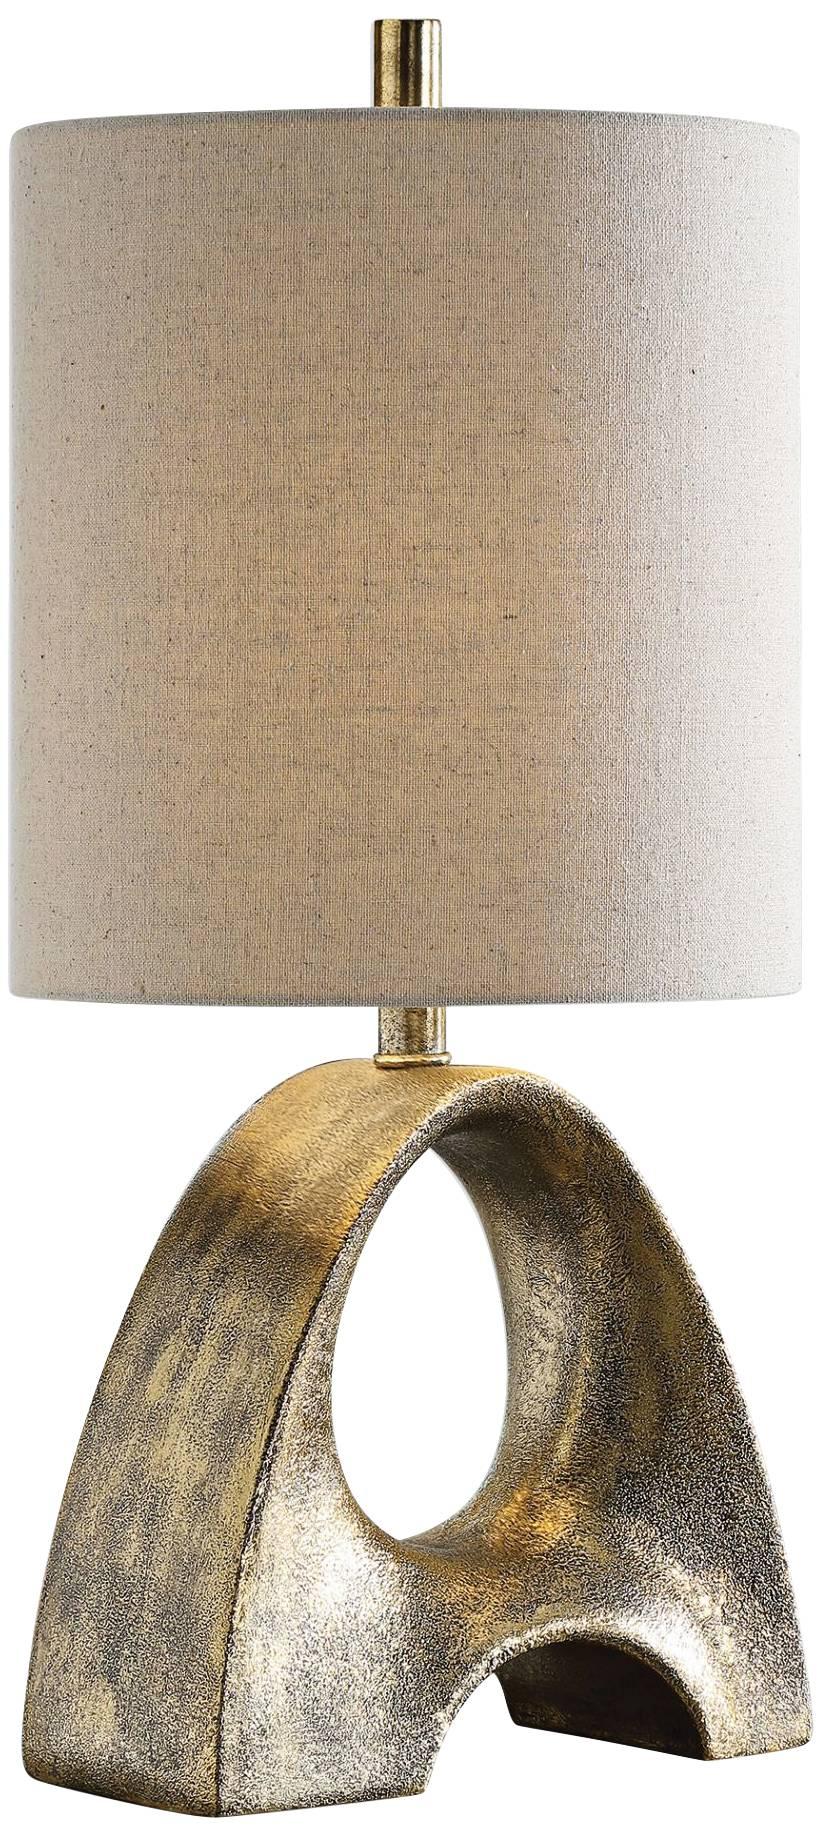 Ladler metallic gold leaf ceramic buffet table lamp